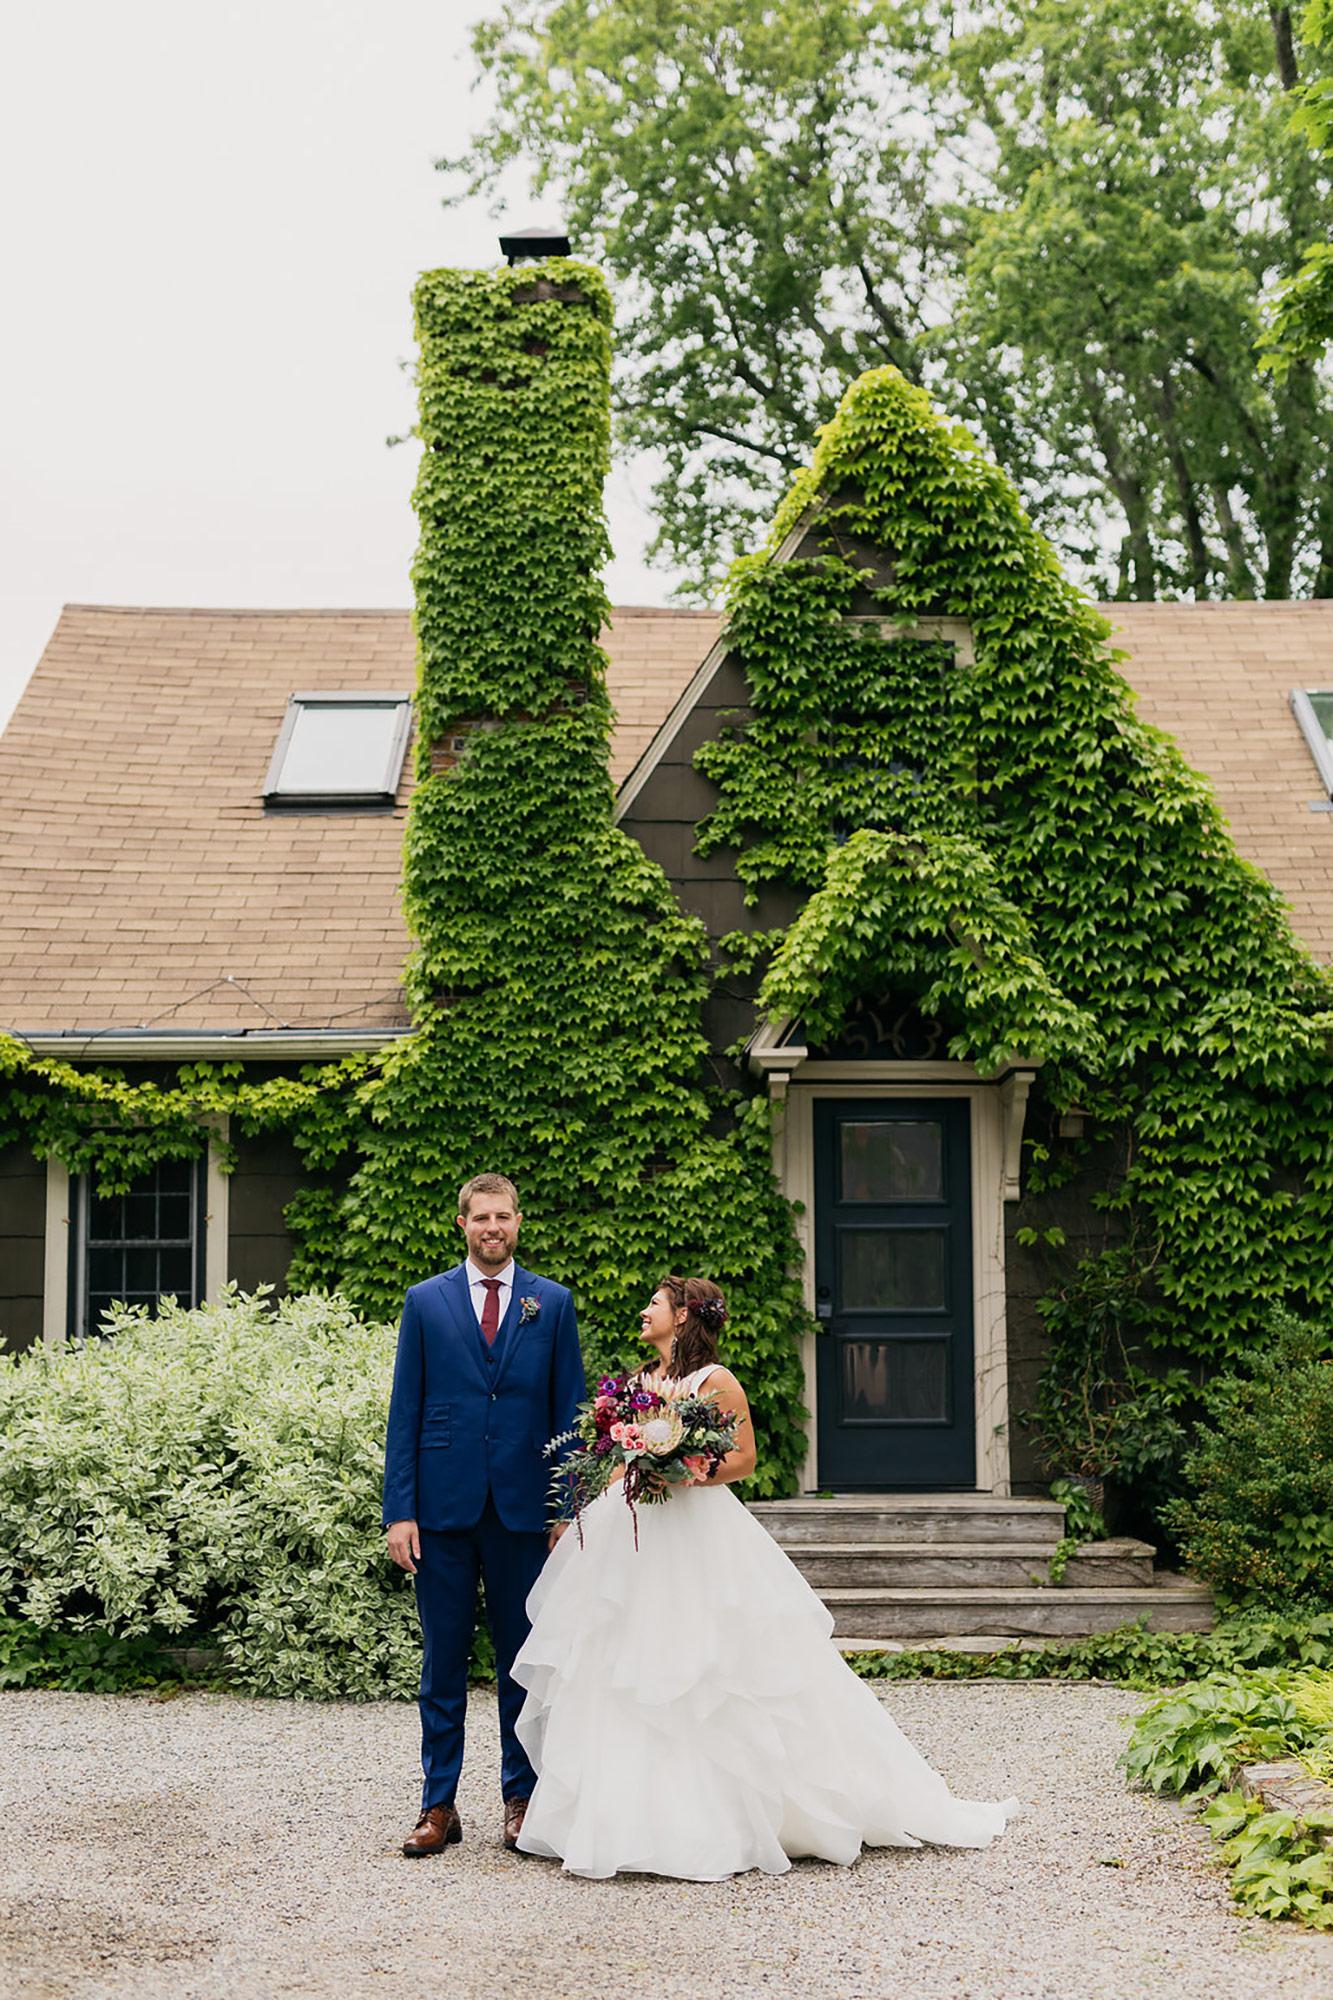 Kurtz-Orchards-Wedding-Niagara-wedding-Vineyard-Bride-Photography-by-Kayla-Rocca-007.JPG